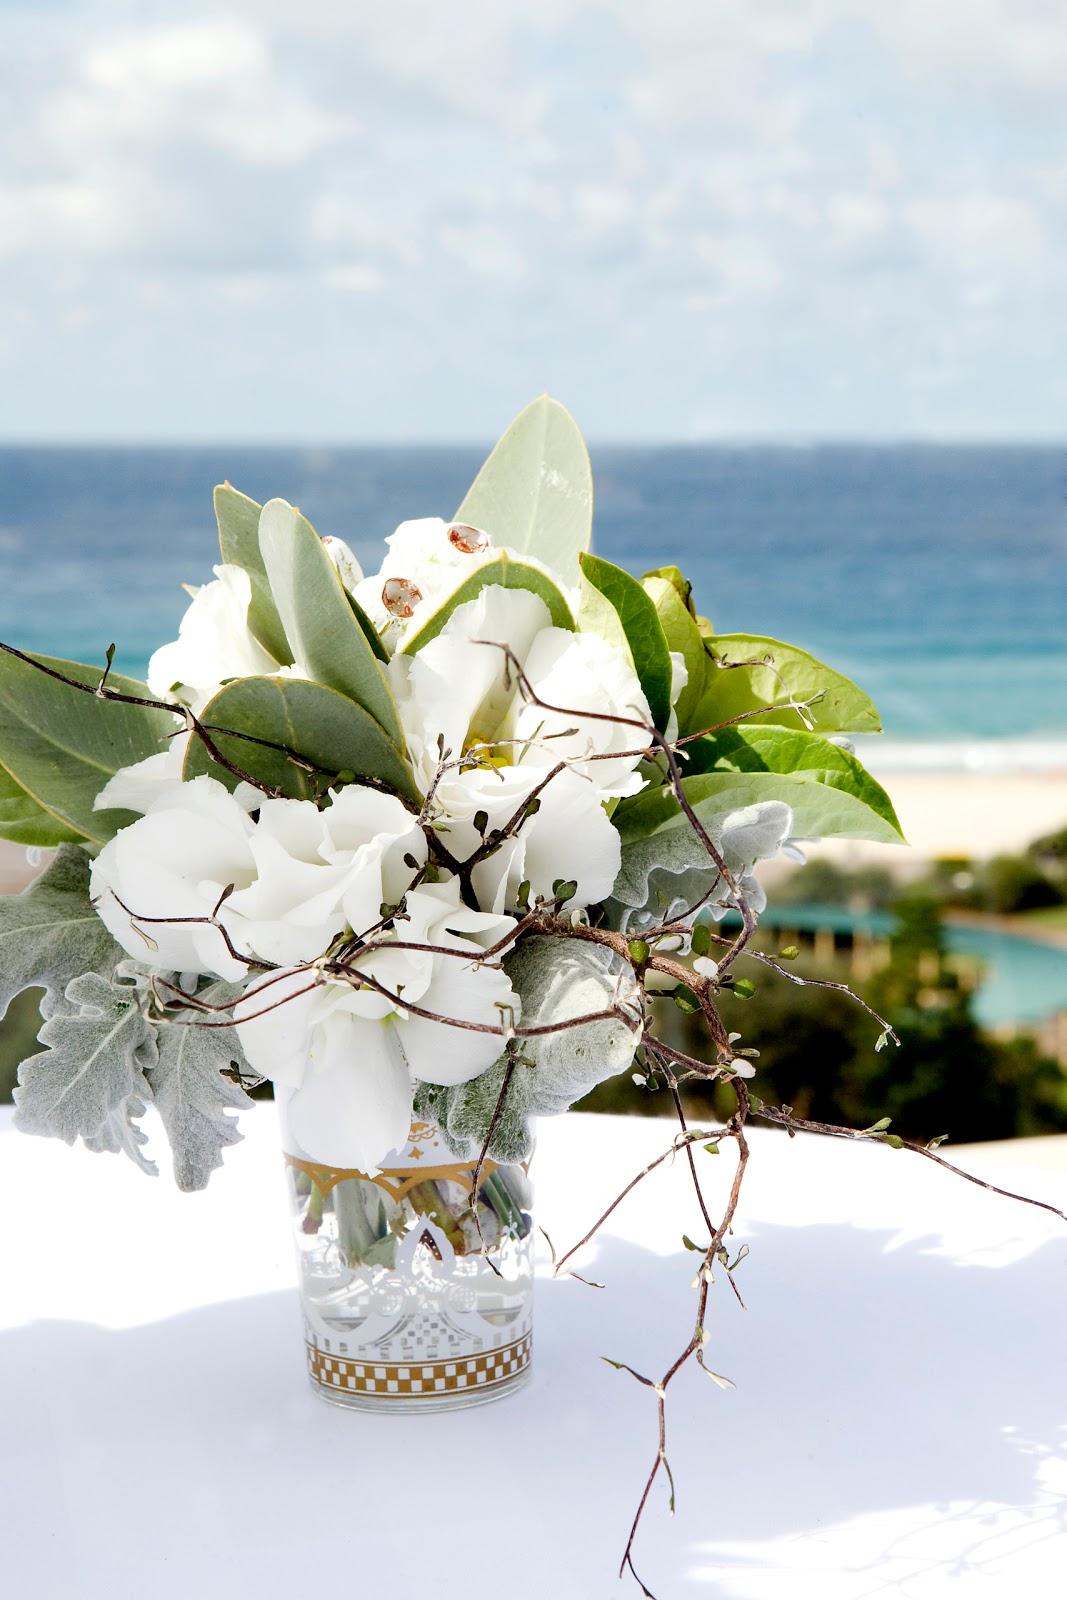 Swiss Grand Resort & Spa, Bondi Beach, Sydney, Australia